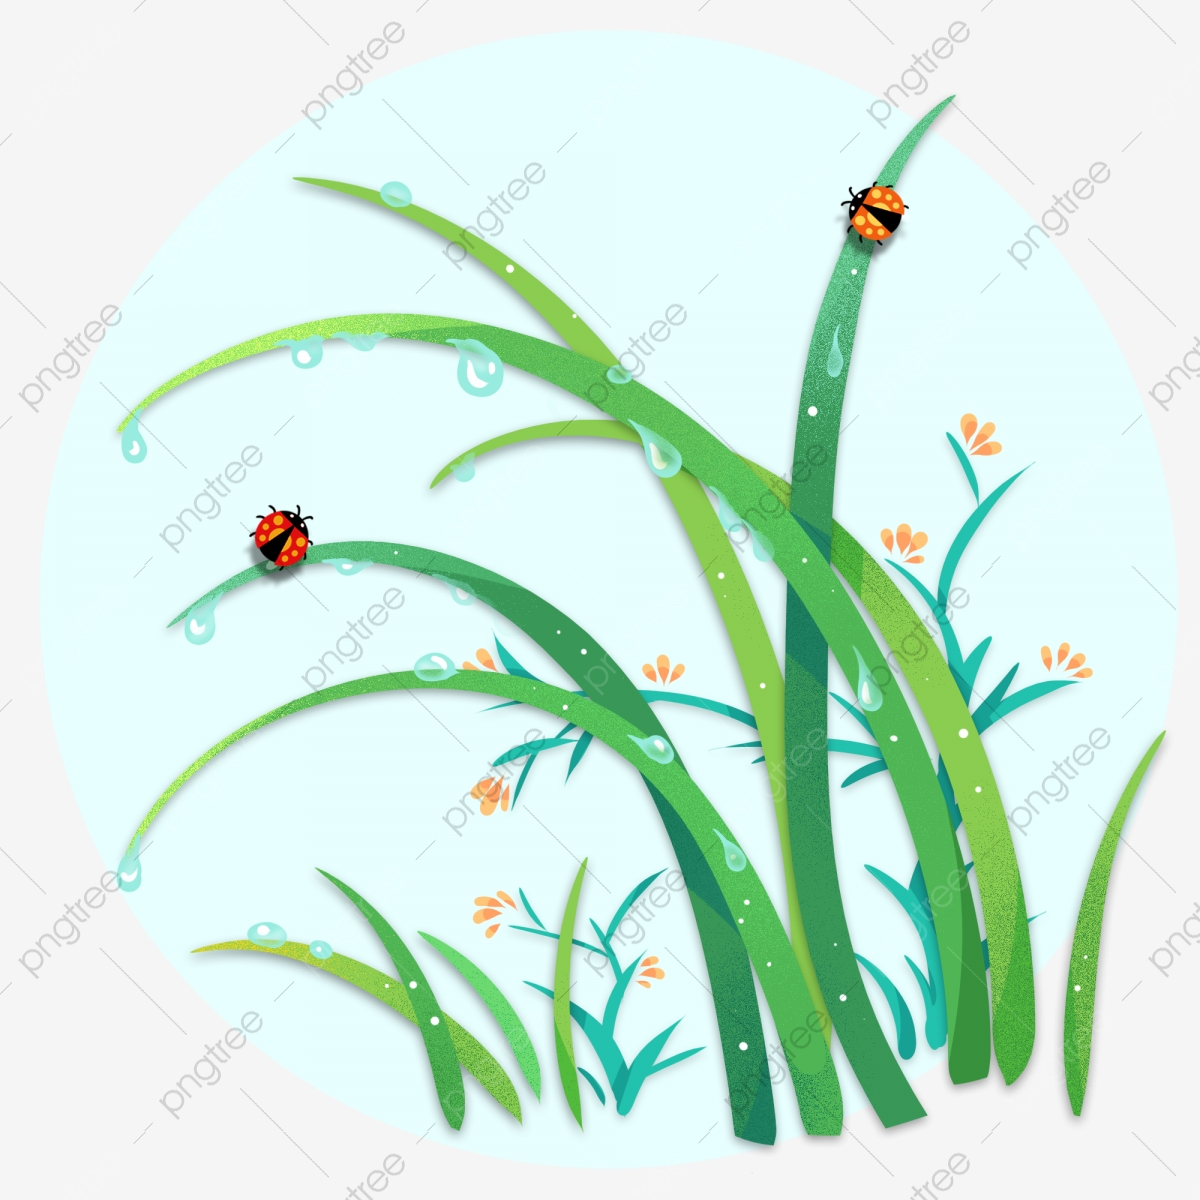 Grass clipart rain. Valley plant small fresh